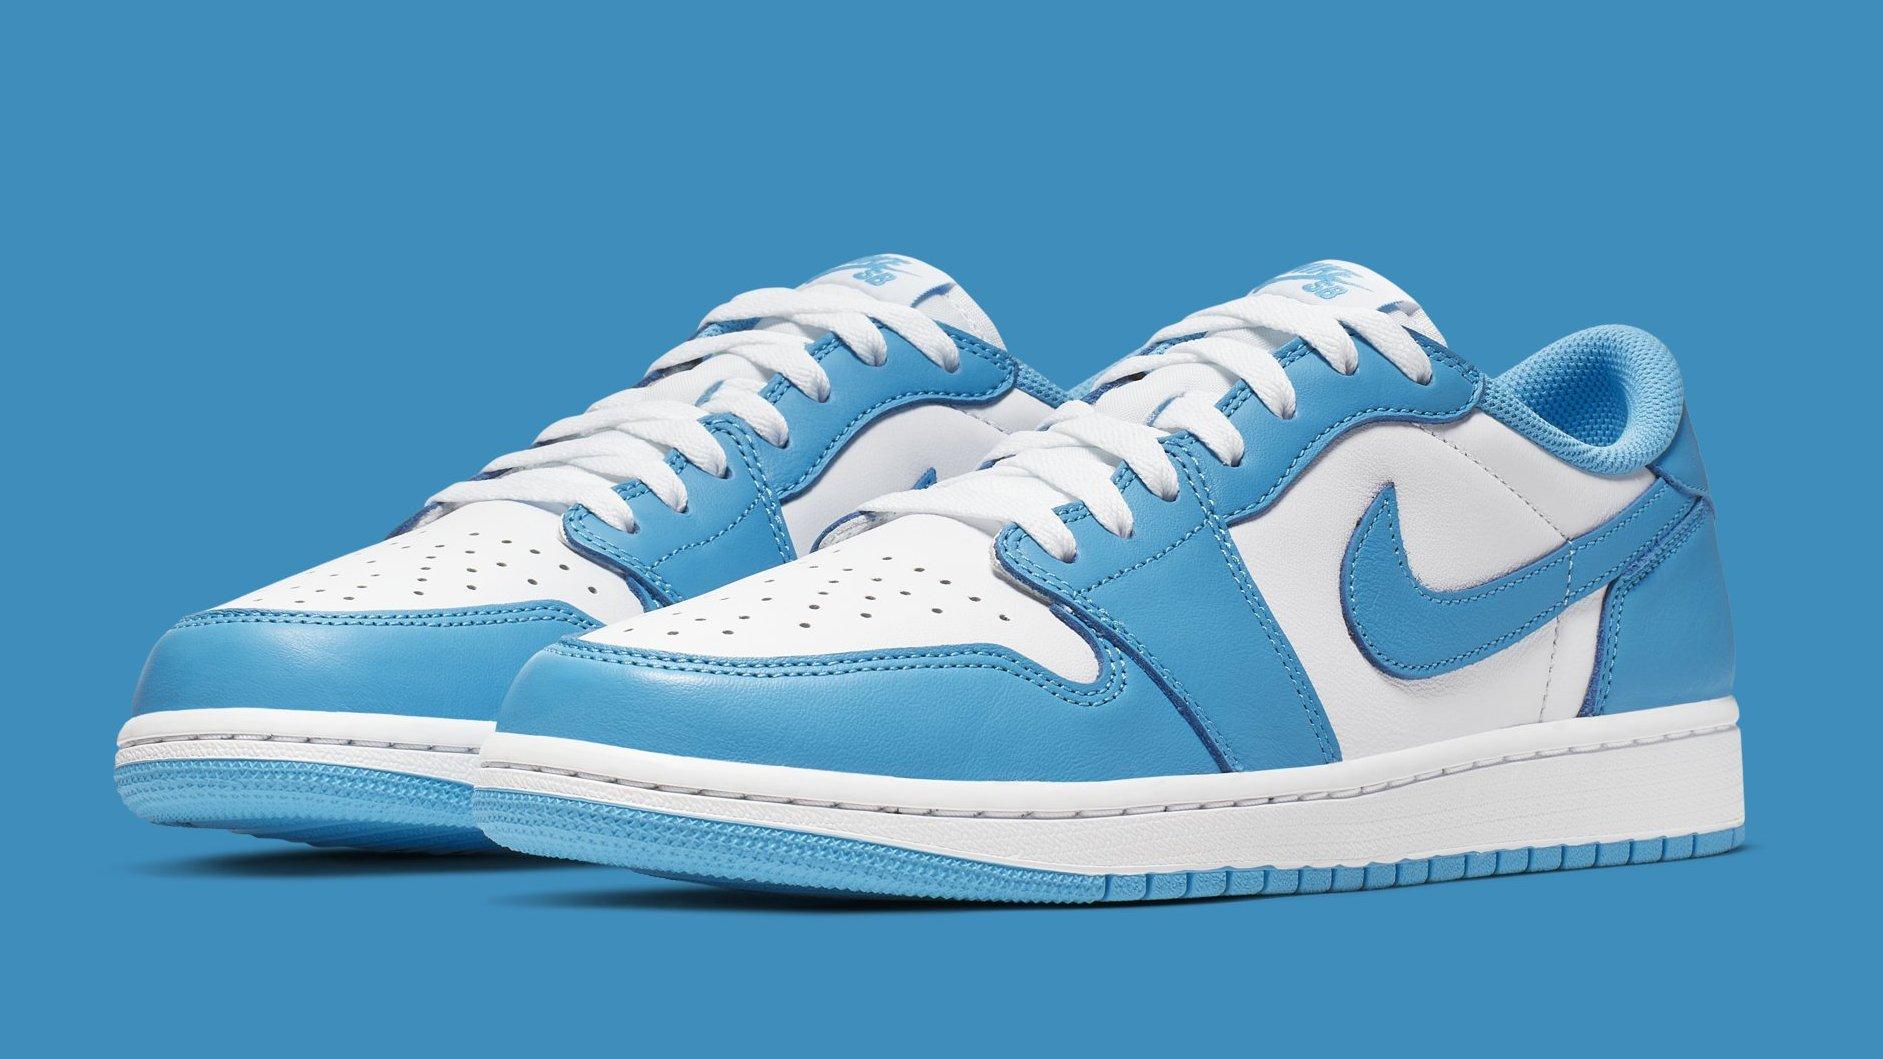 aplausos silencio subasta  Eric Koston x Nike SB x Air Jordan 1 Low x 'Carolina Blue' Release Date |  Sole Collector